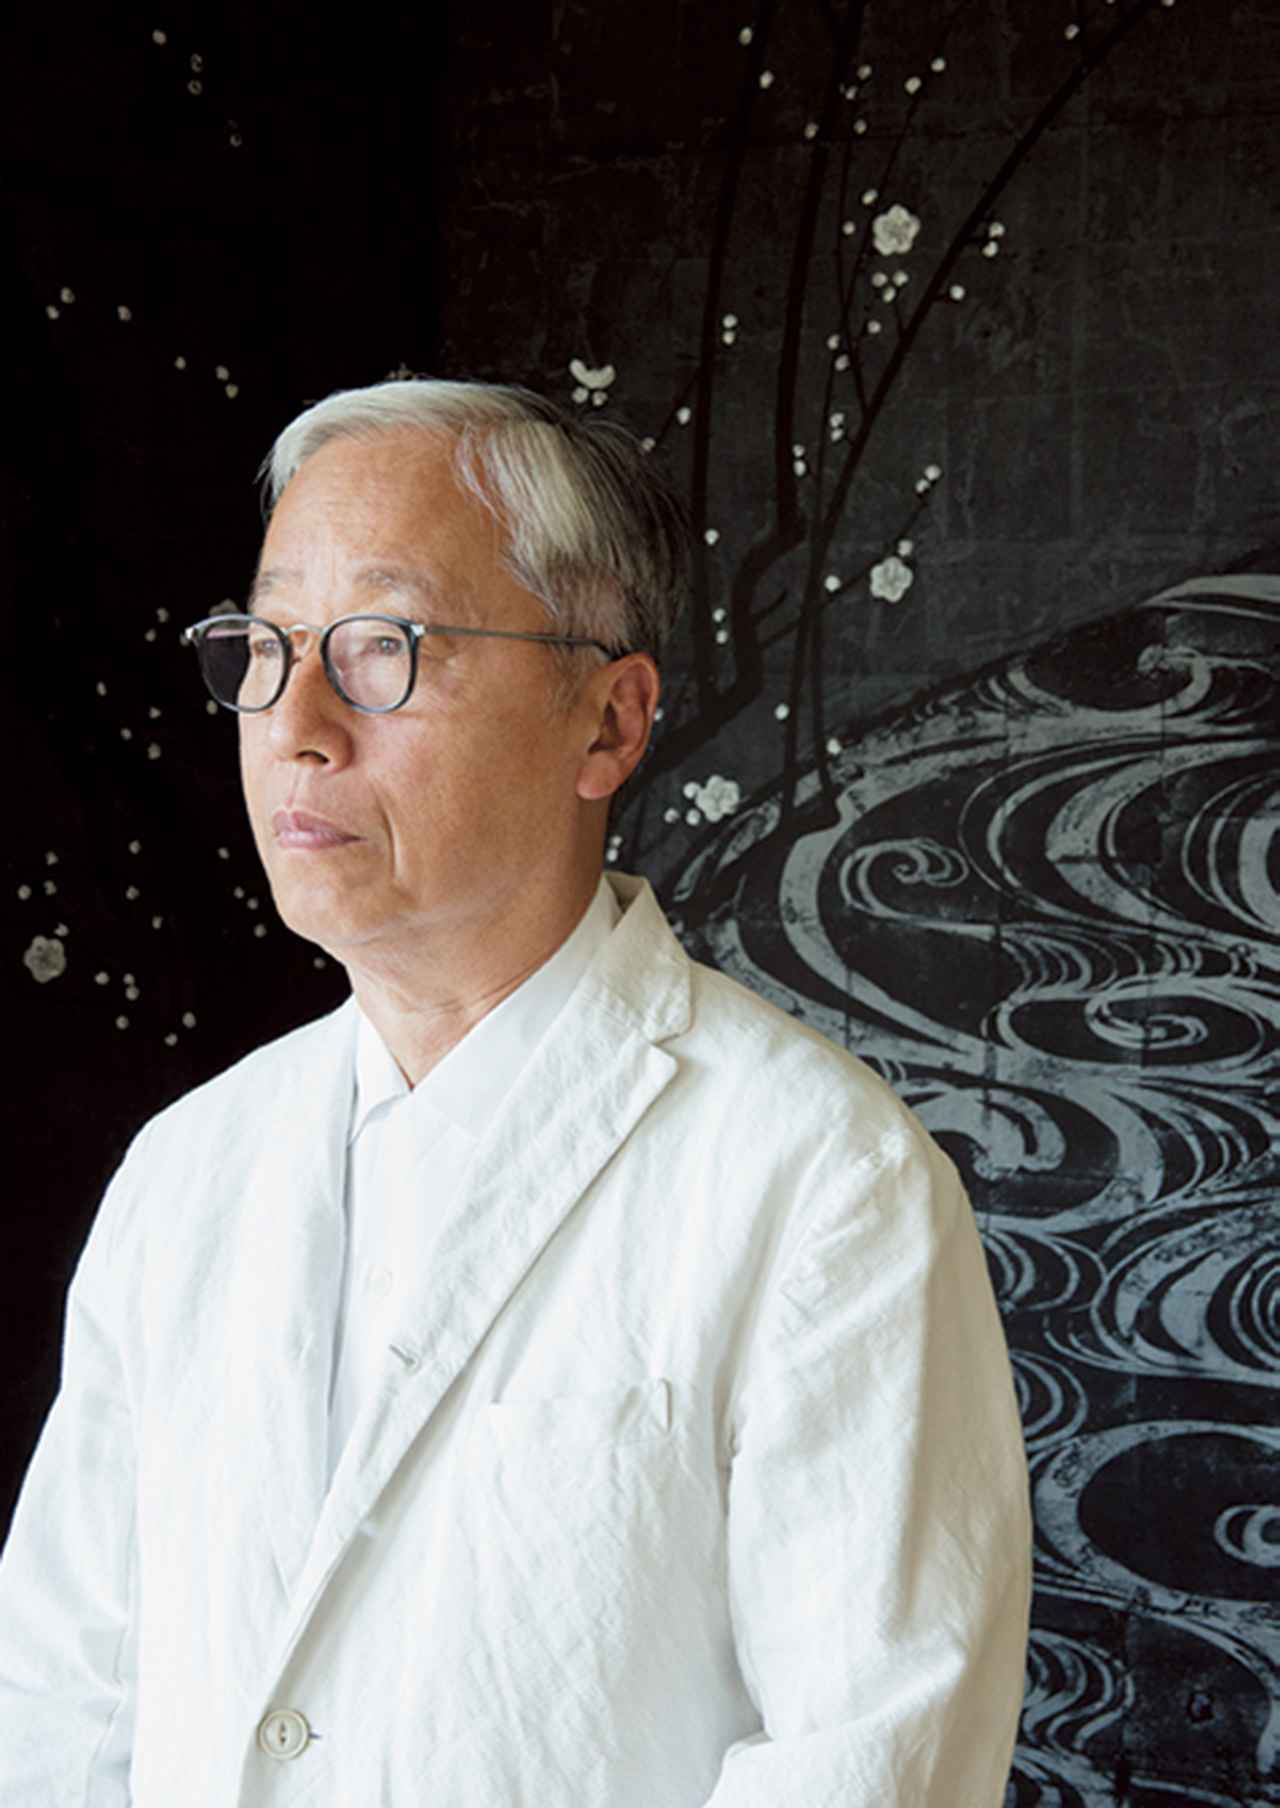 Images : 1番目の画像 - 「時と向き合うアーティスト、 杉本博司」のアルバム - T JAPAN:The New York Times Style Magazine 公式サイト